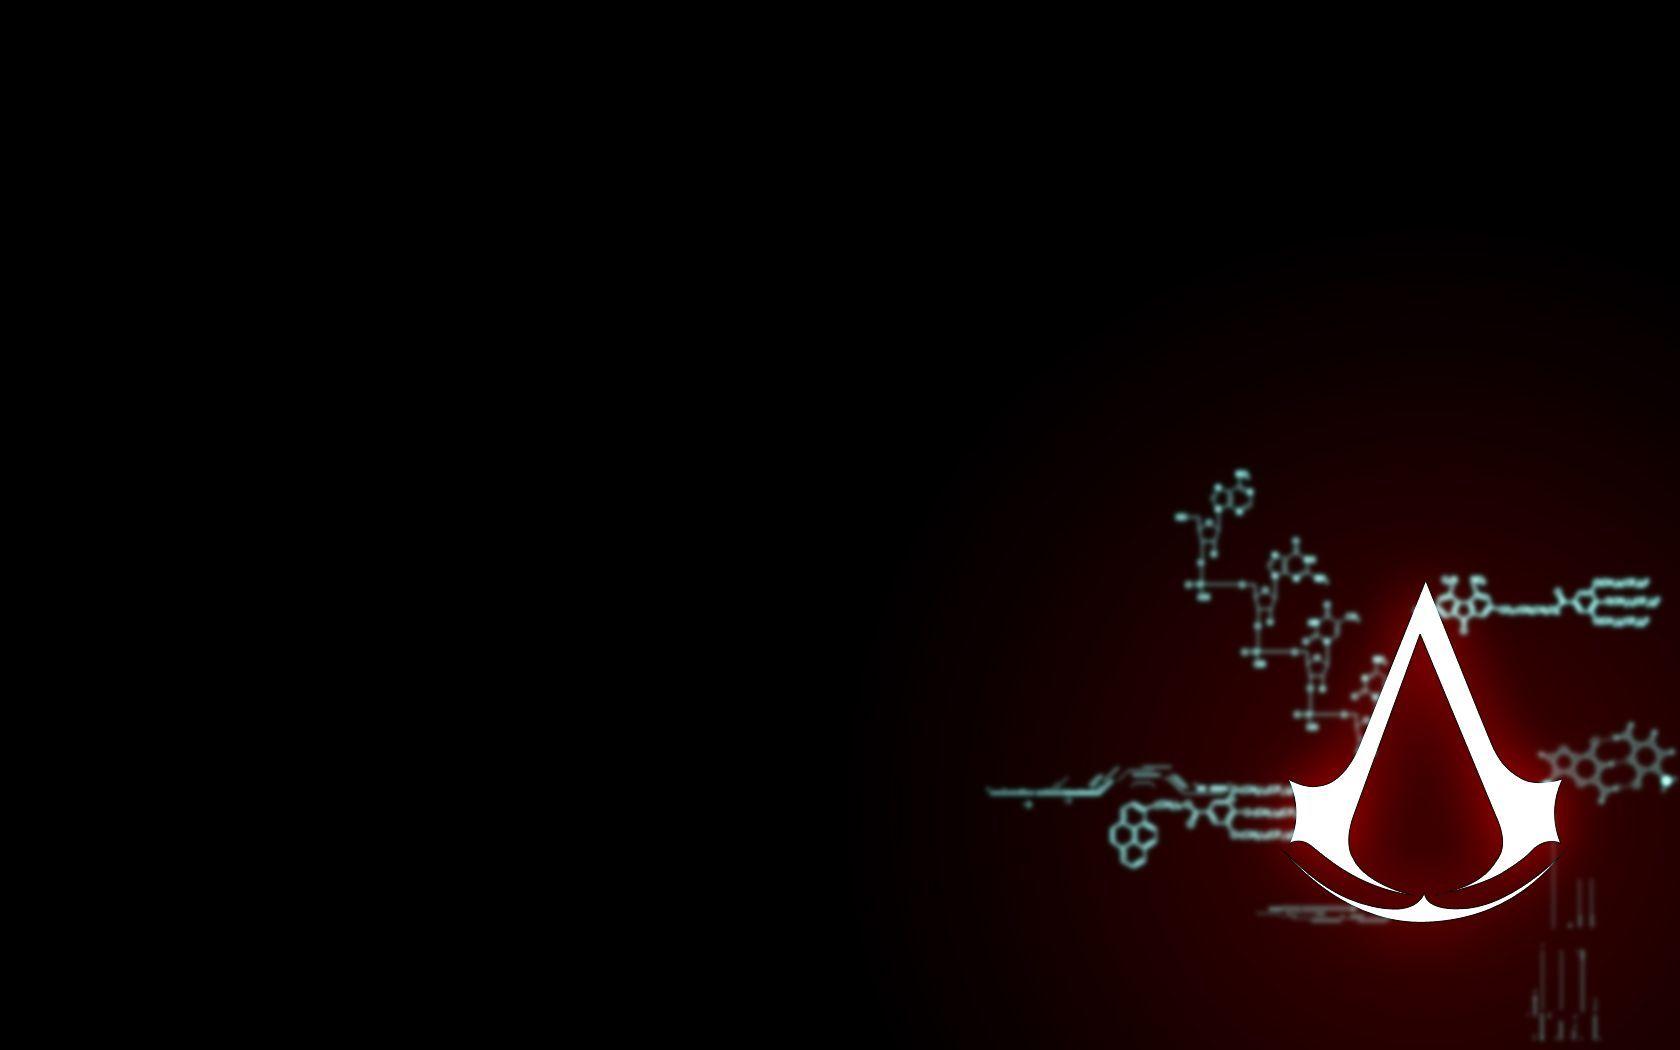 Art Gaming White Design Wallpaper Video Games We Heart It Series